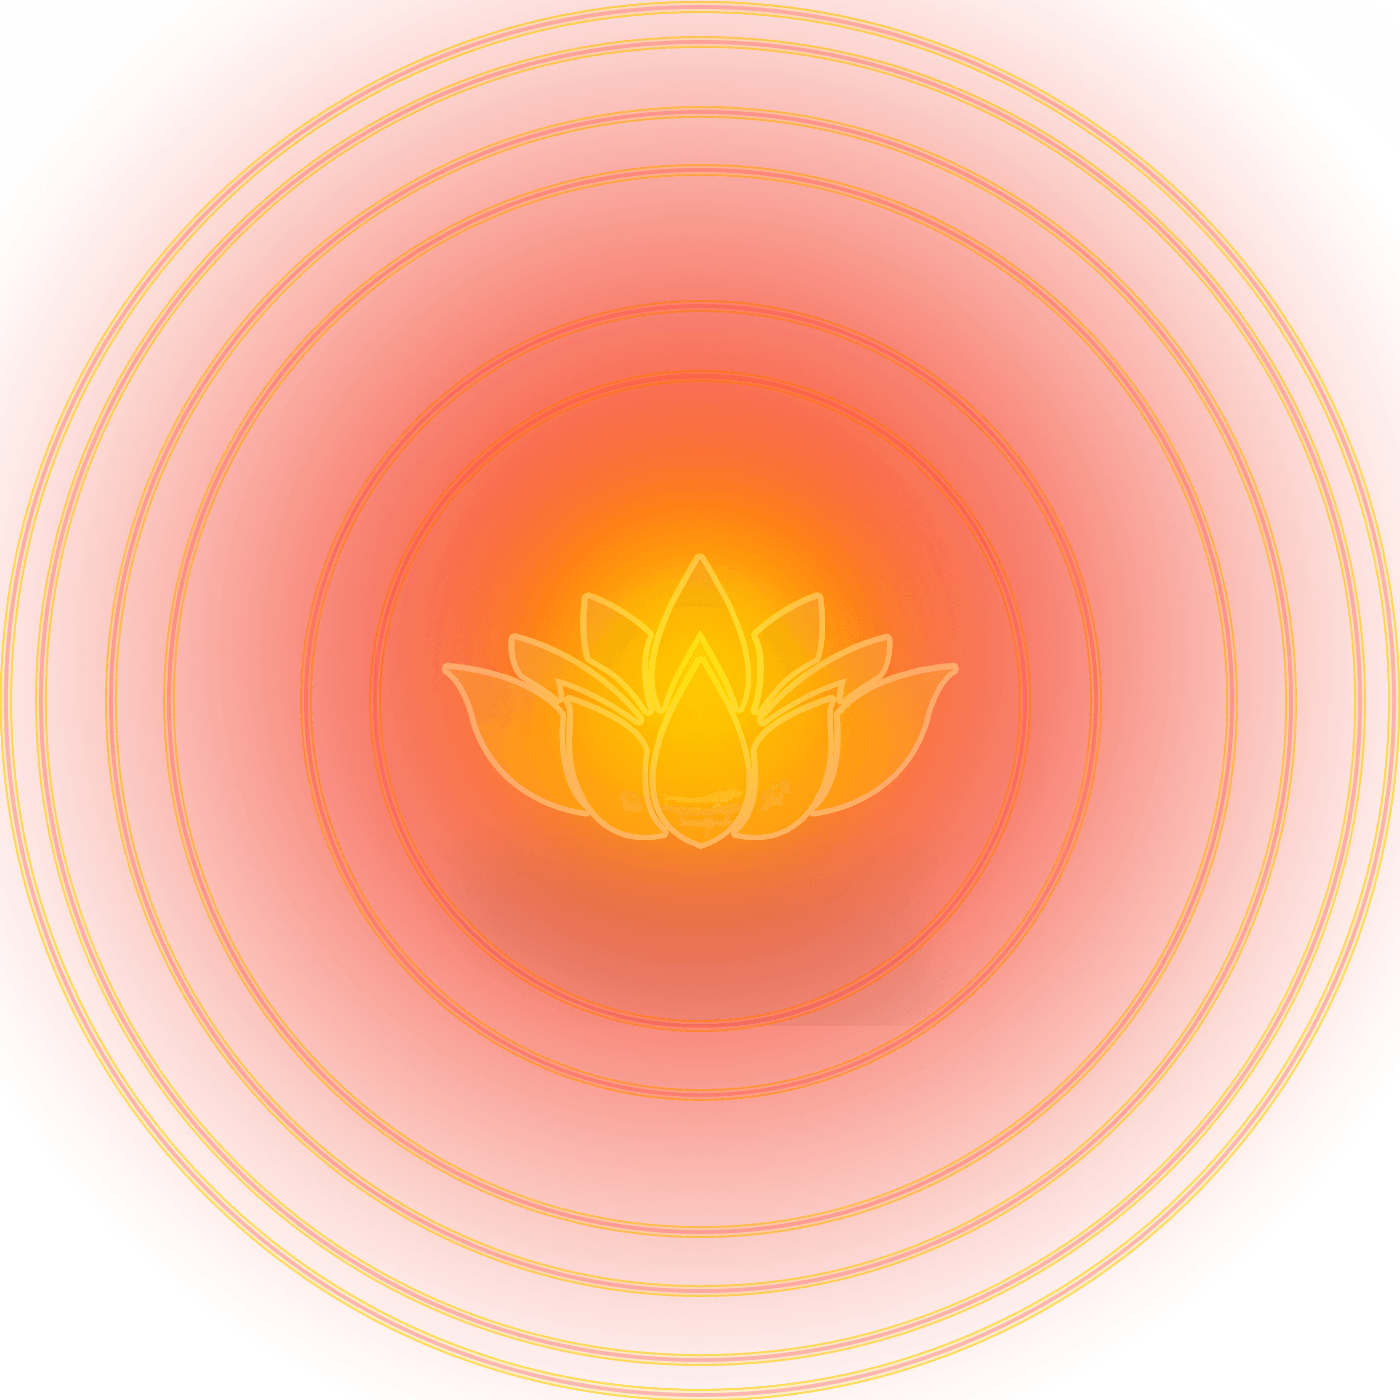 resonant_you_lotusrings.png